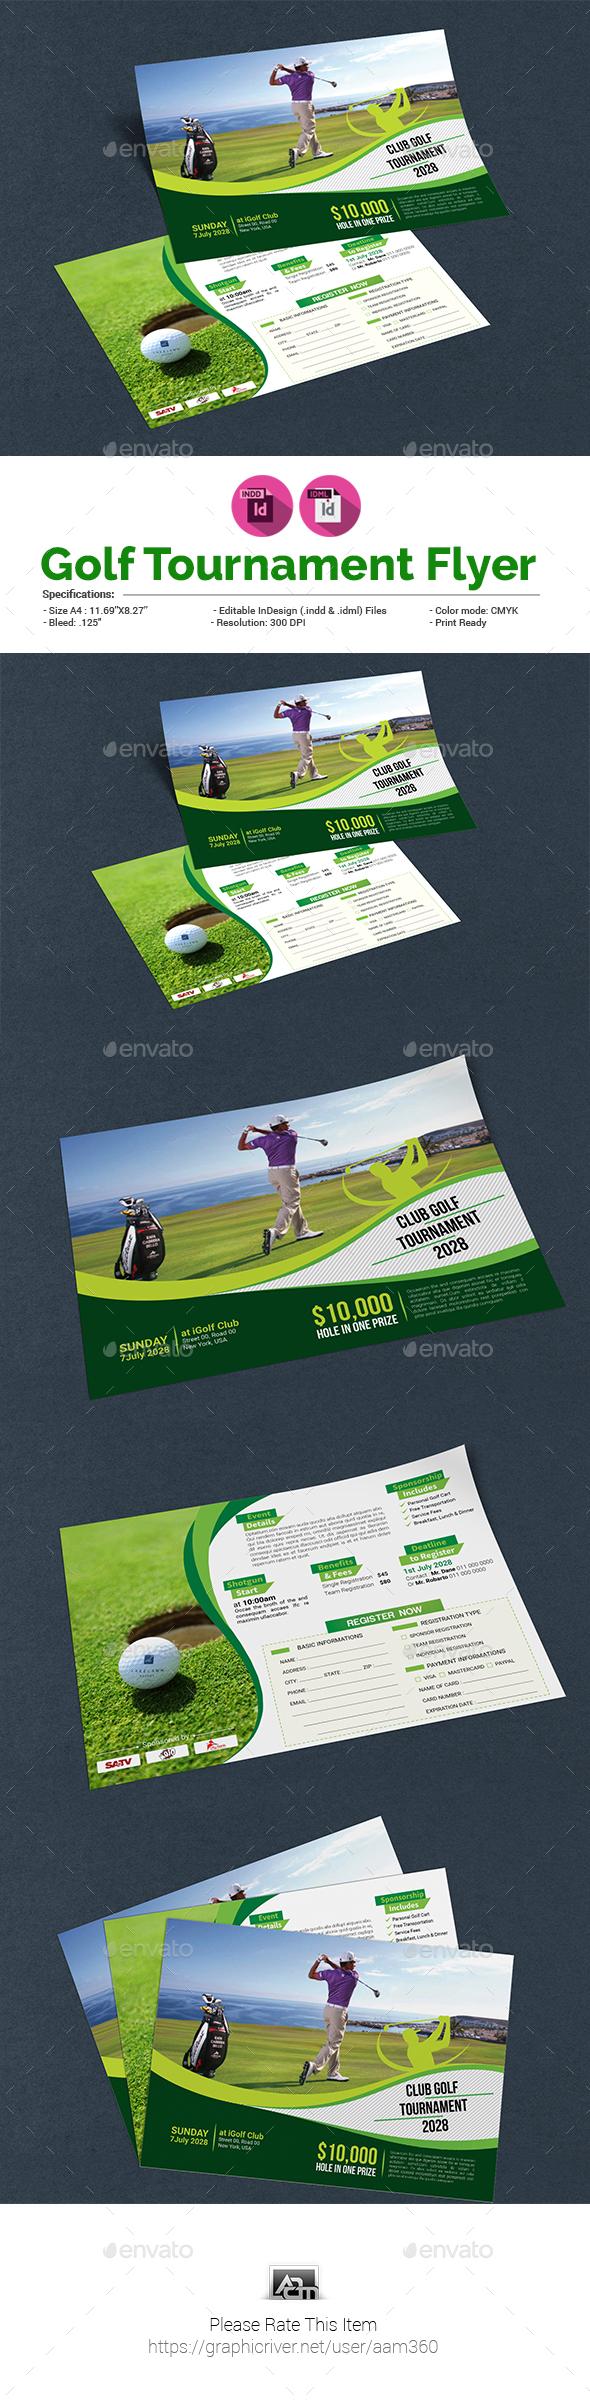 Golf Tournament Flyer Template - Sports Events